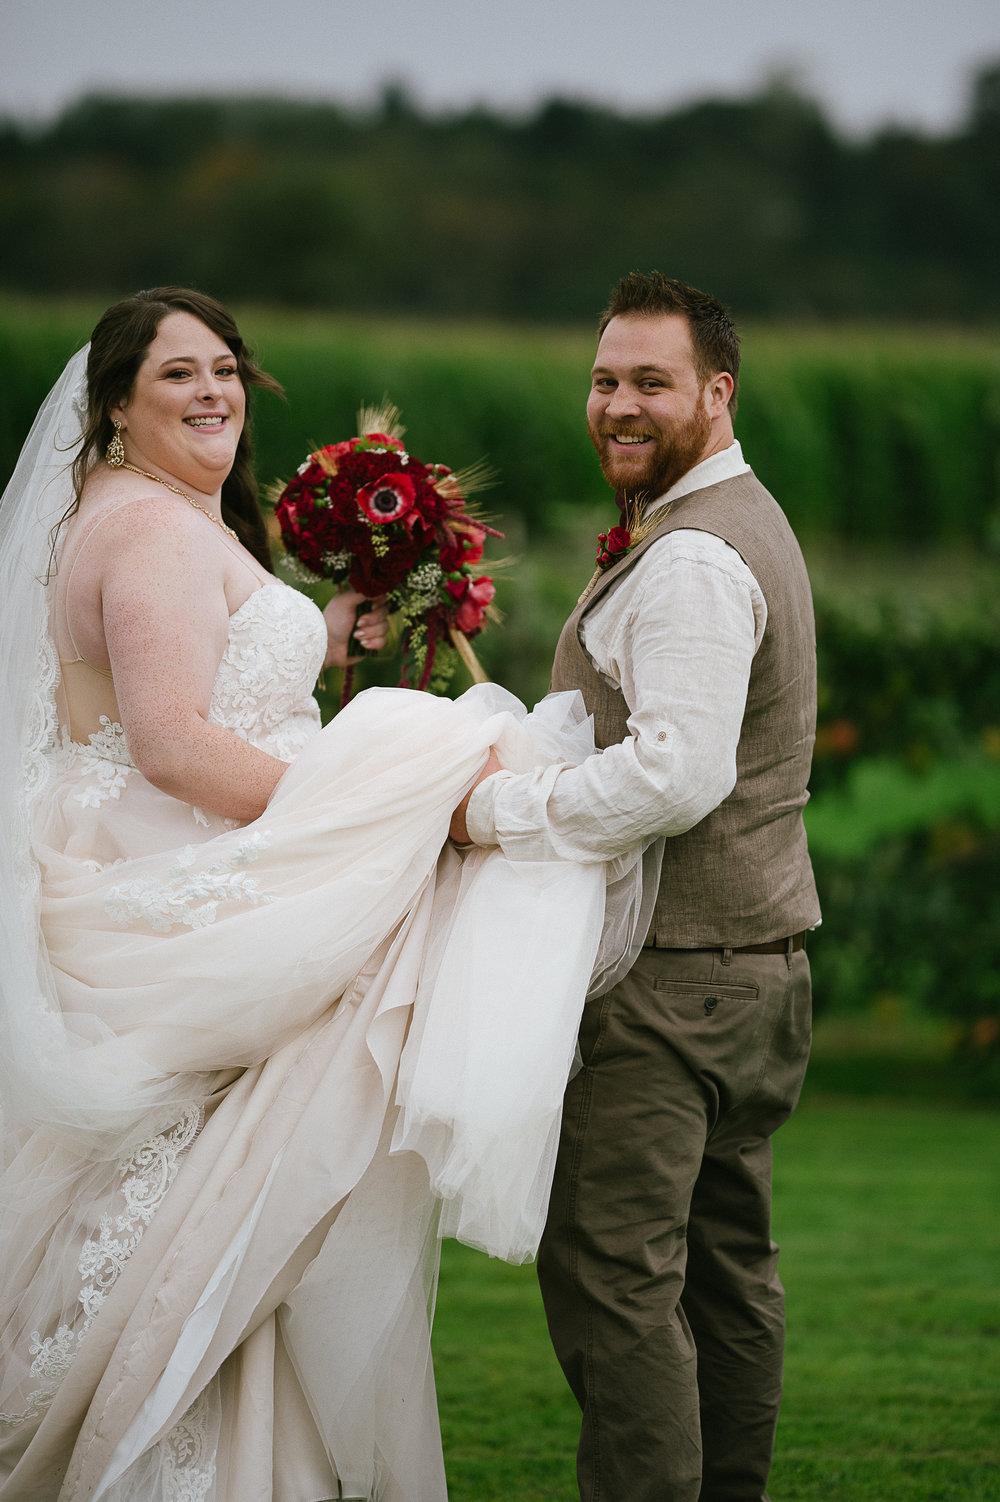 Swan Trail Farm Wedding_Sarah Schurman + Brian Skadan_Snohomish Wedding_Kelsey Lane Photography-5759.jpg